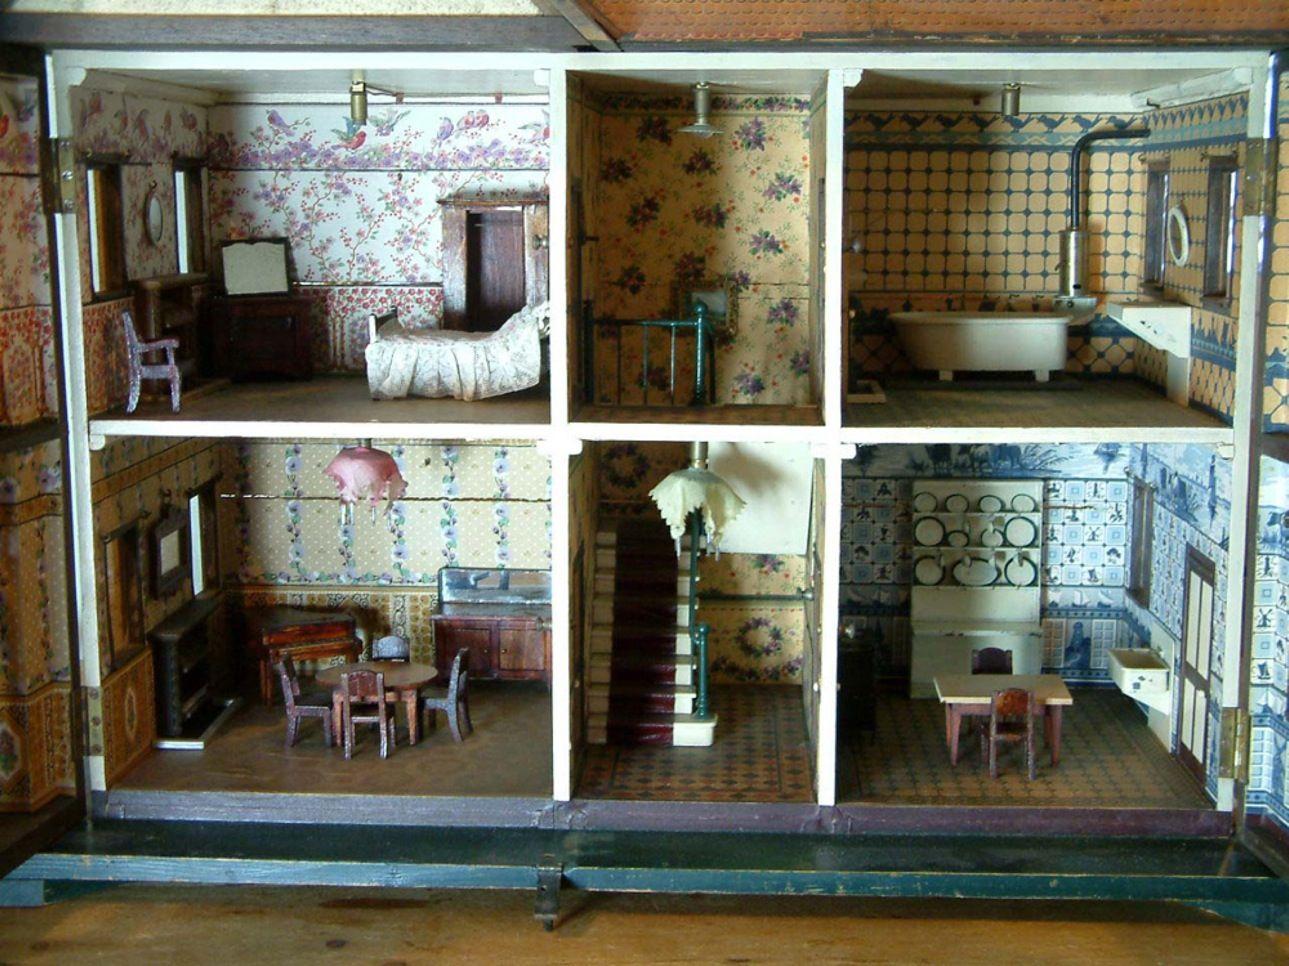 For Sale Books \u0026 Mags , Dolls Houses Past \u0026 Present